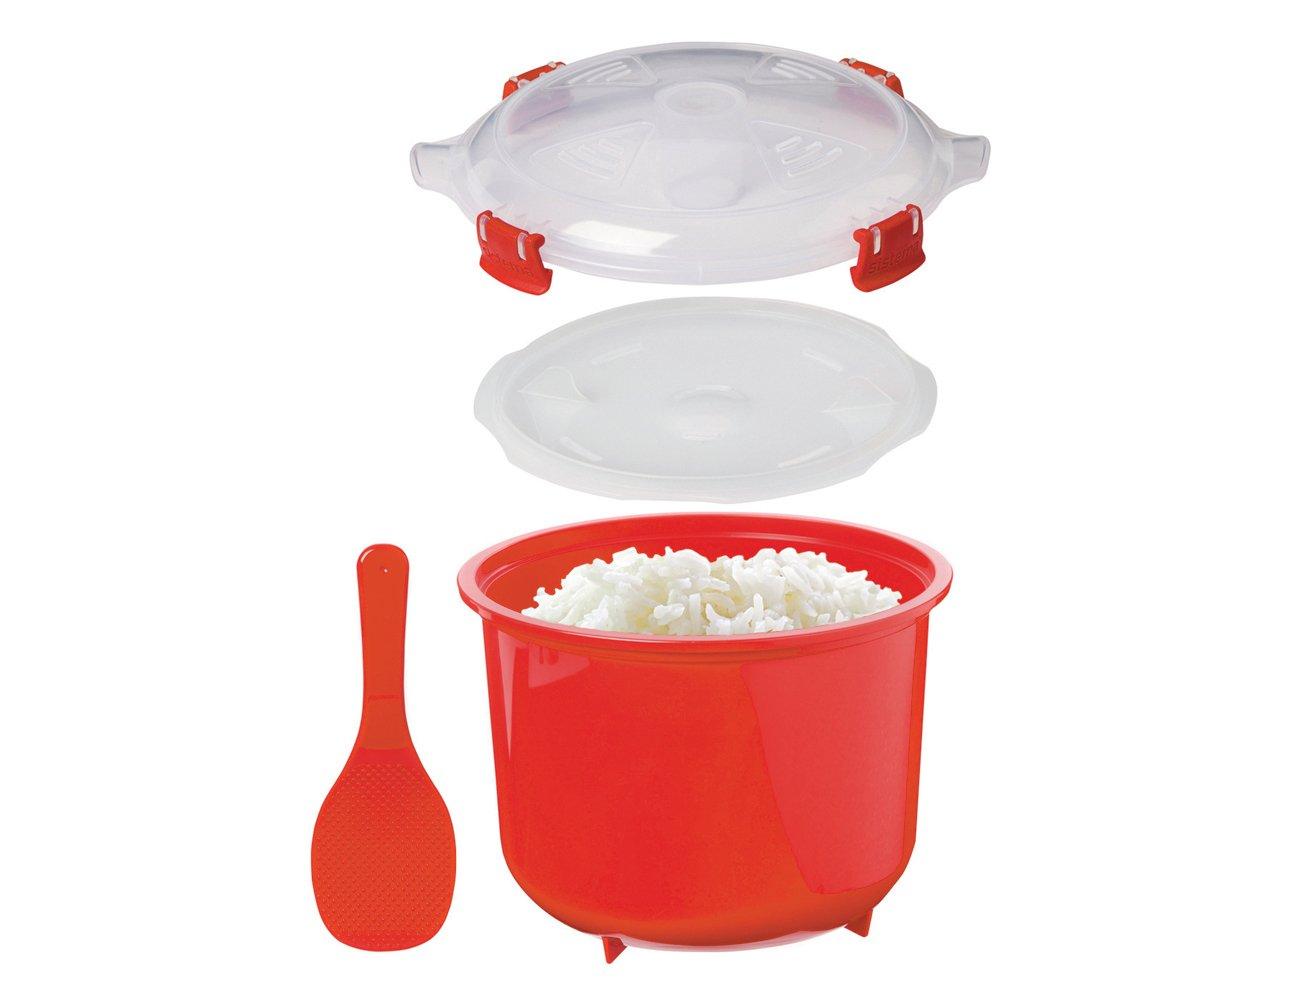 sistema microwave cookware rice stea end 5 18 2018 8 15 pm. Black Bedroom Furniture Sets. Home Design Ideas